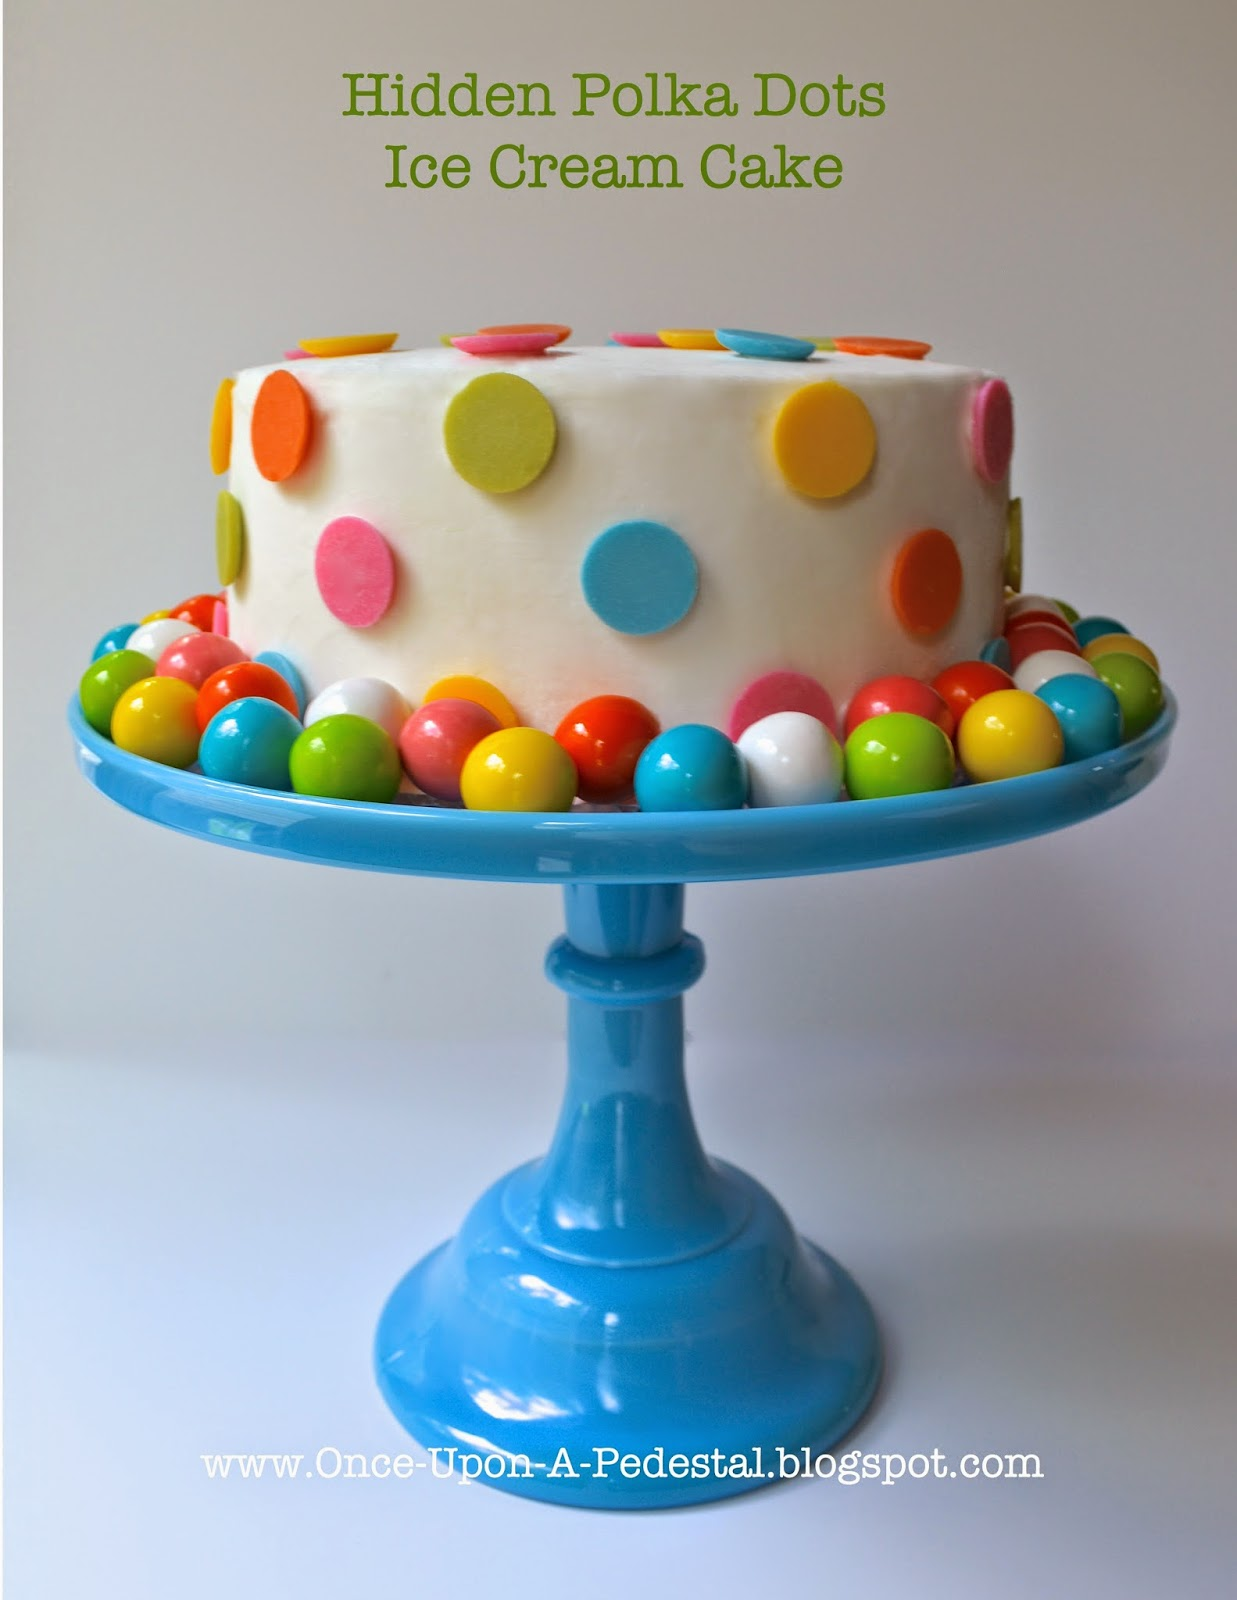 polka-dot-suprise-inside-cake-rainbow-ice-cream-free-tutorial-deborah-stauch